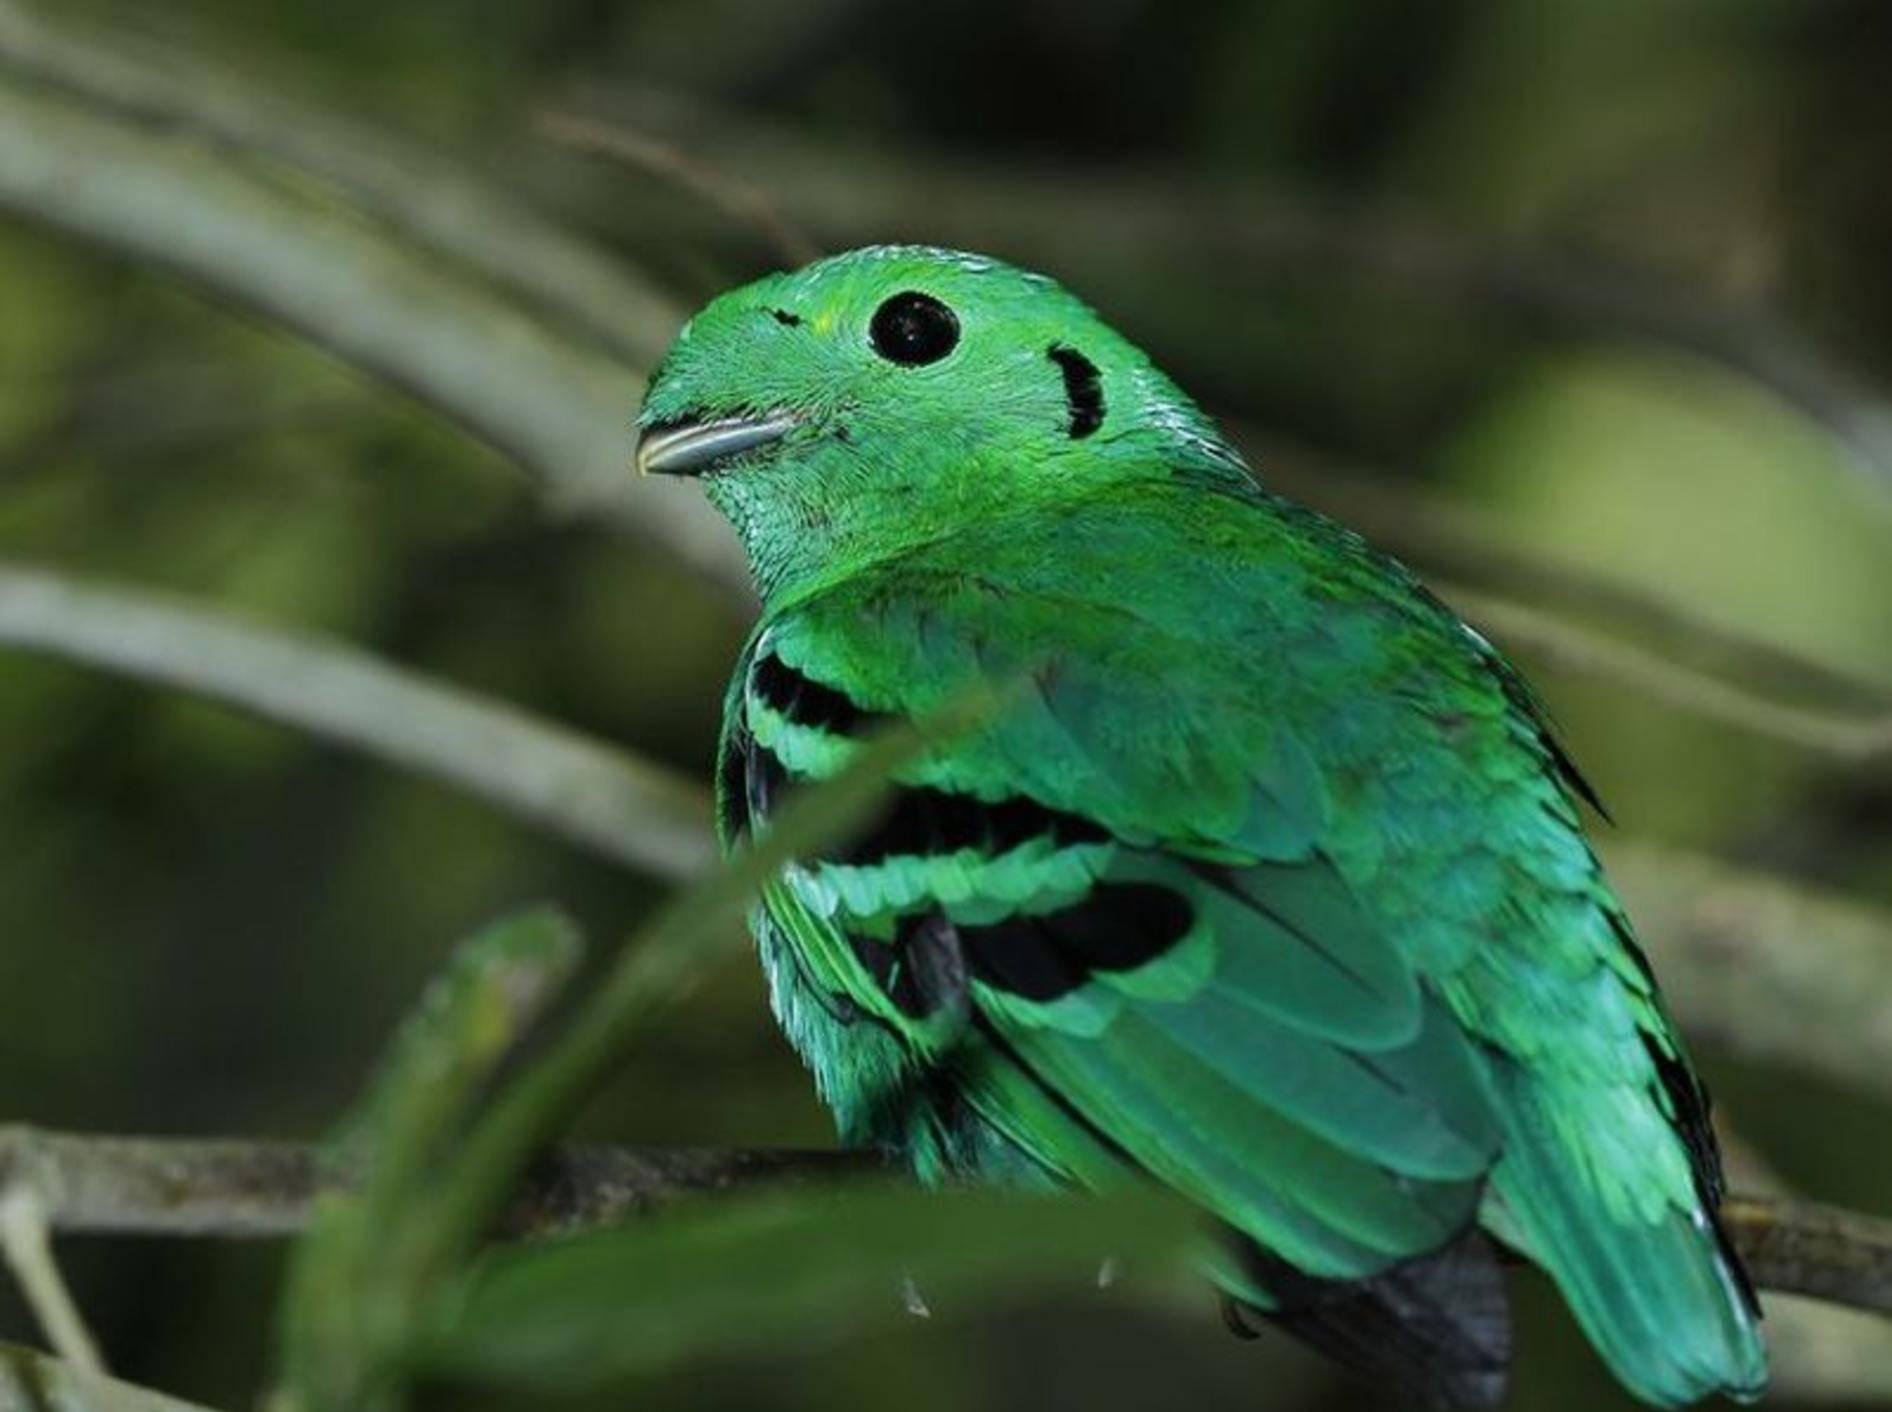 Toller Anblick: Grünkardinal Vogel mit extravagantem Look